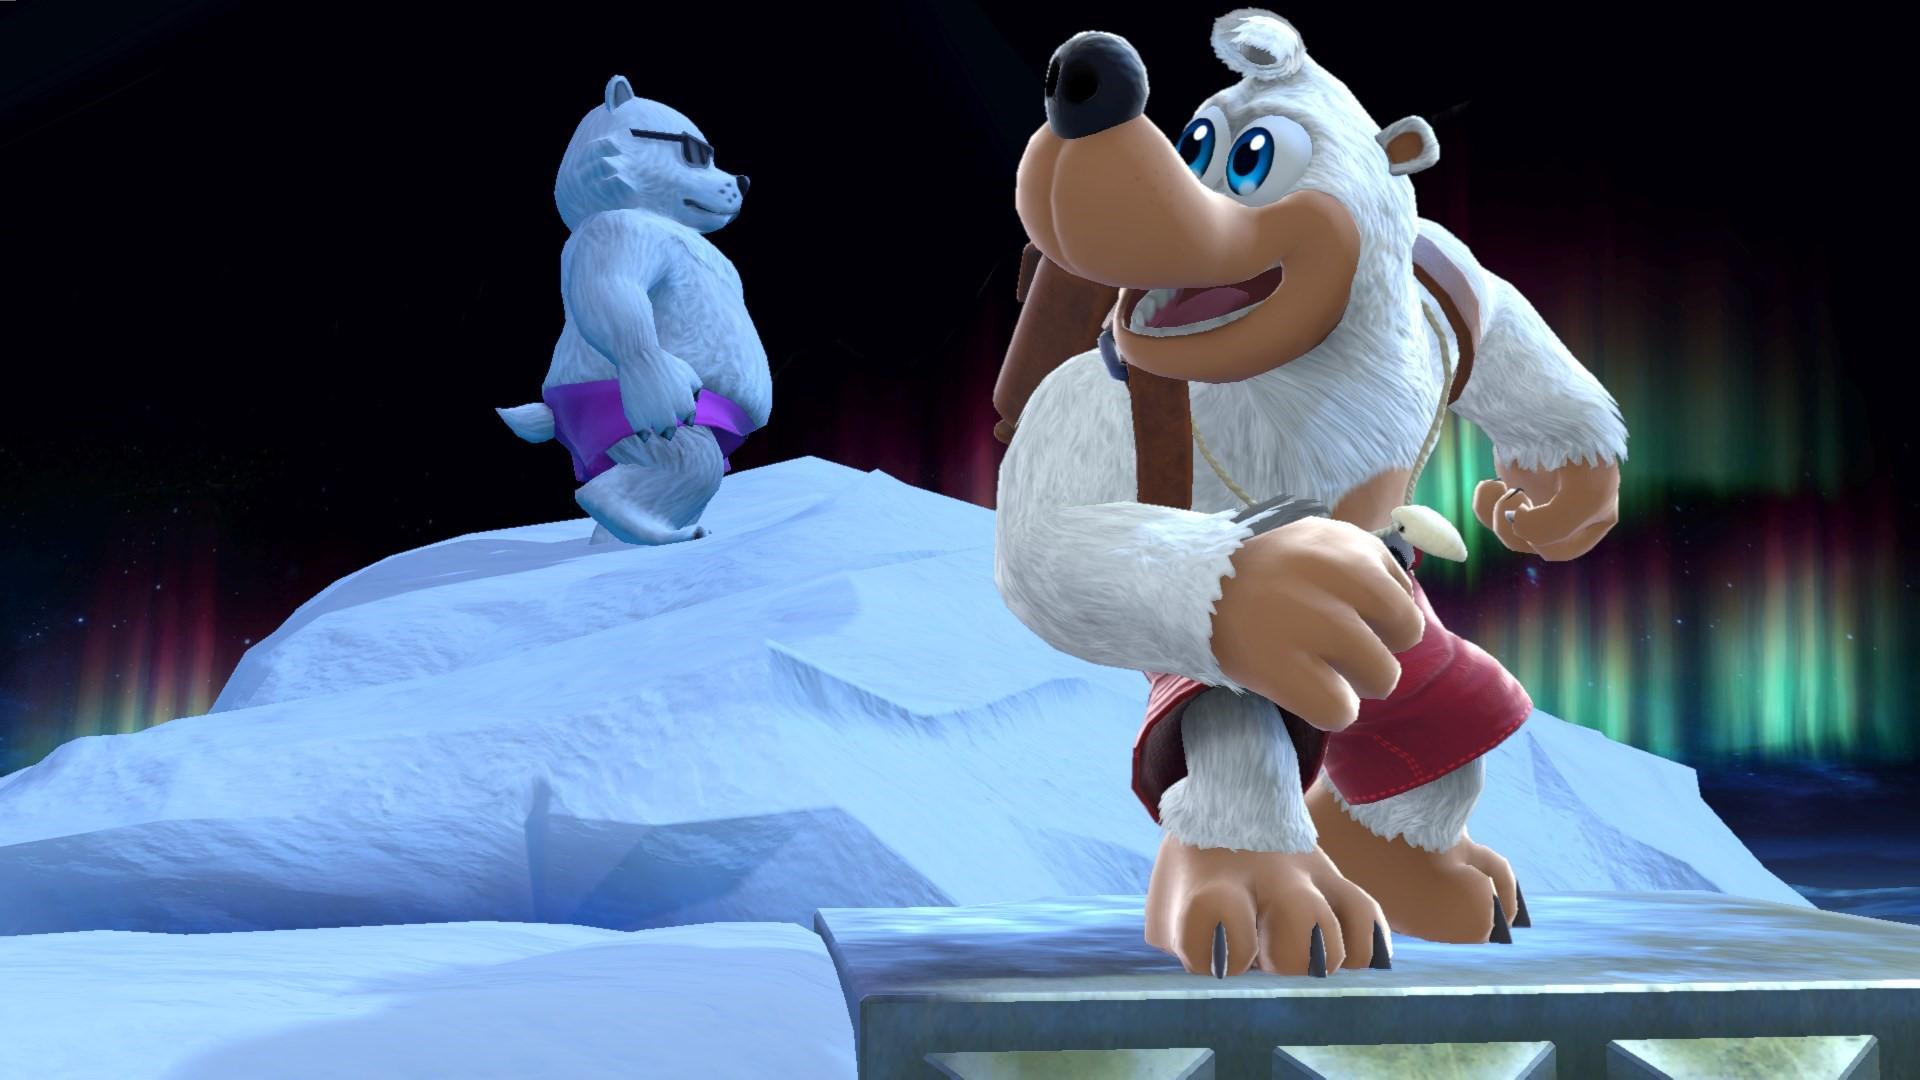 Super Smash Bros. Ultimate footage – Banjo-Kazooie, Sans Mii Fighter costume